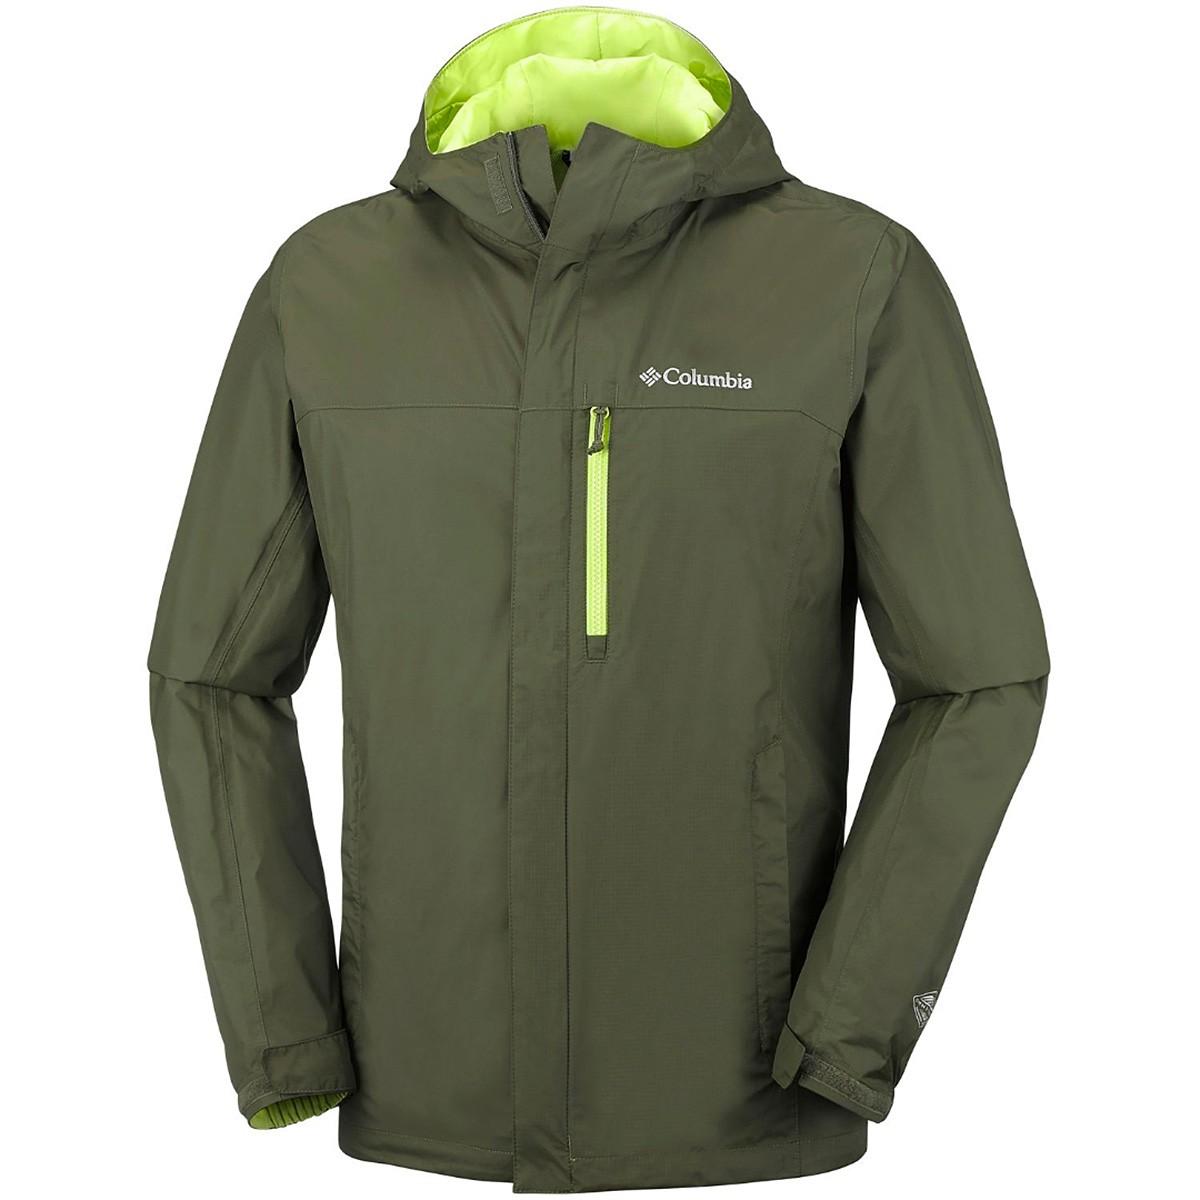 Rain jacket Columbia Pouring Adventure II Man - Outdoor ...